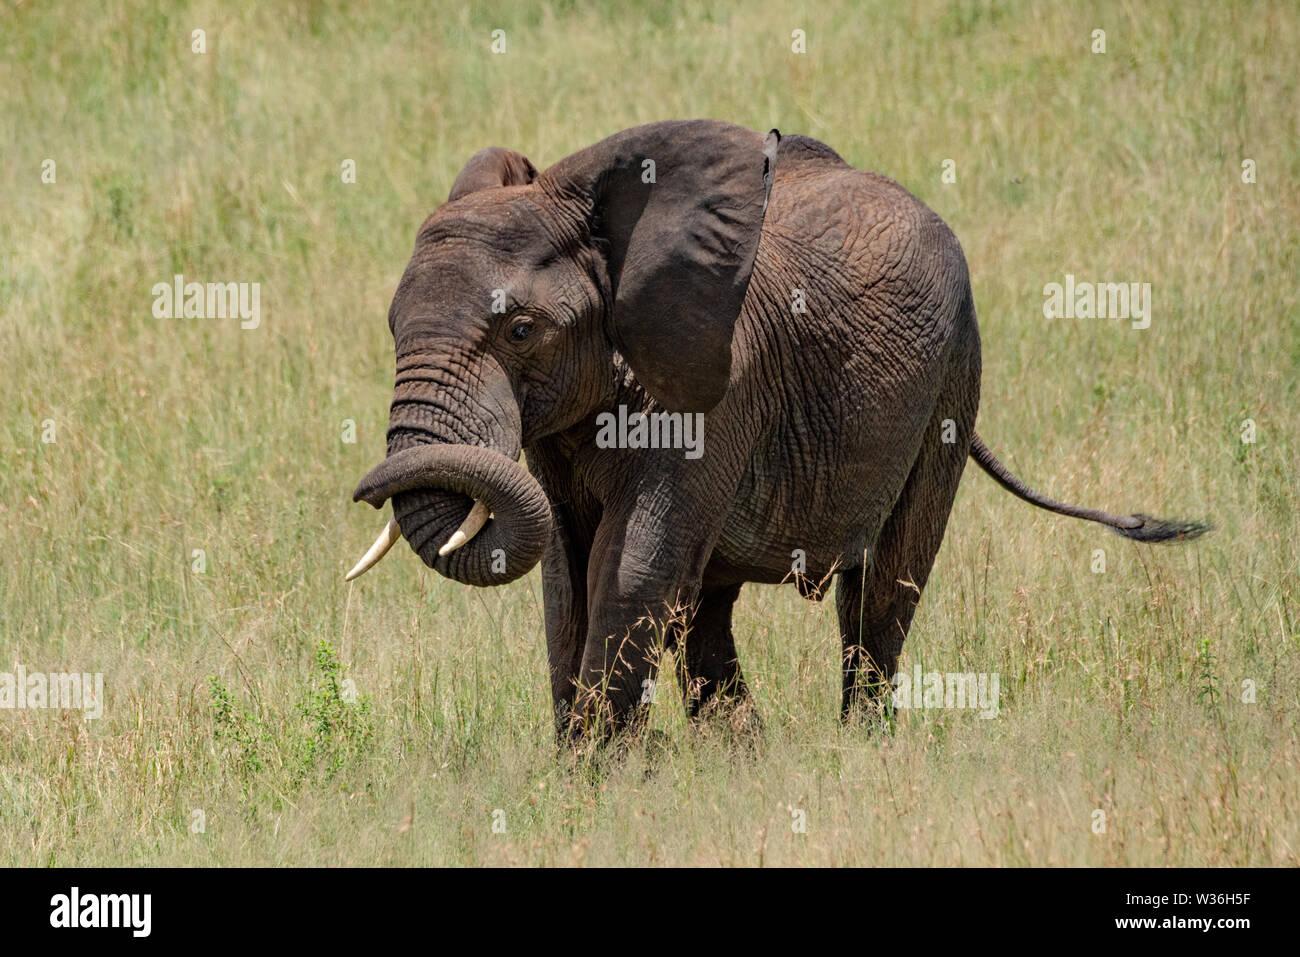 African elephant winding trunk around its tusk - Stock Image